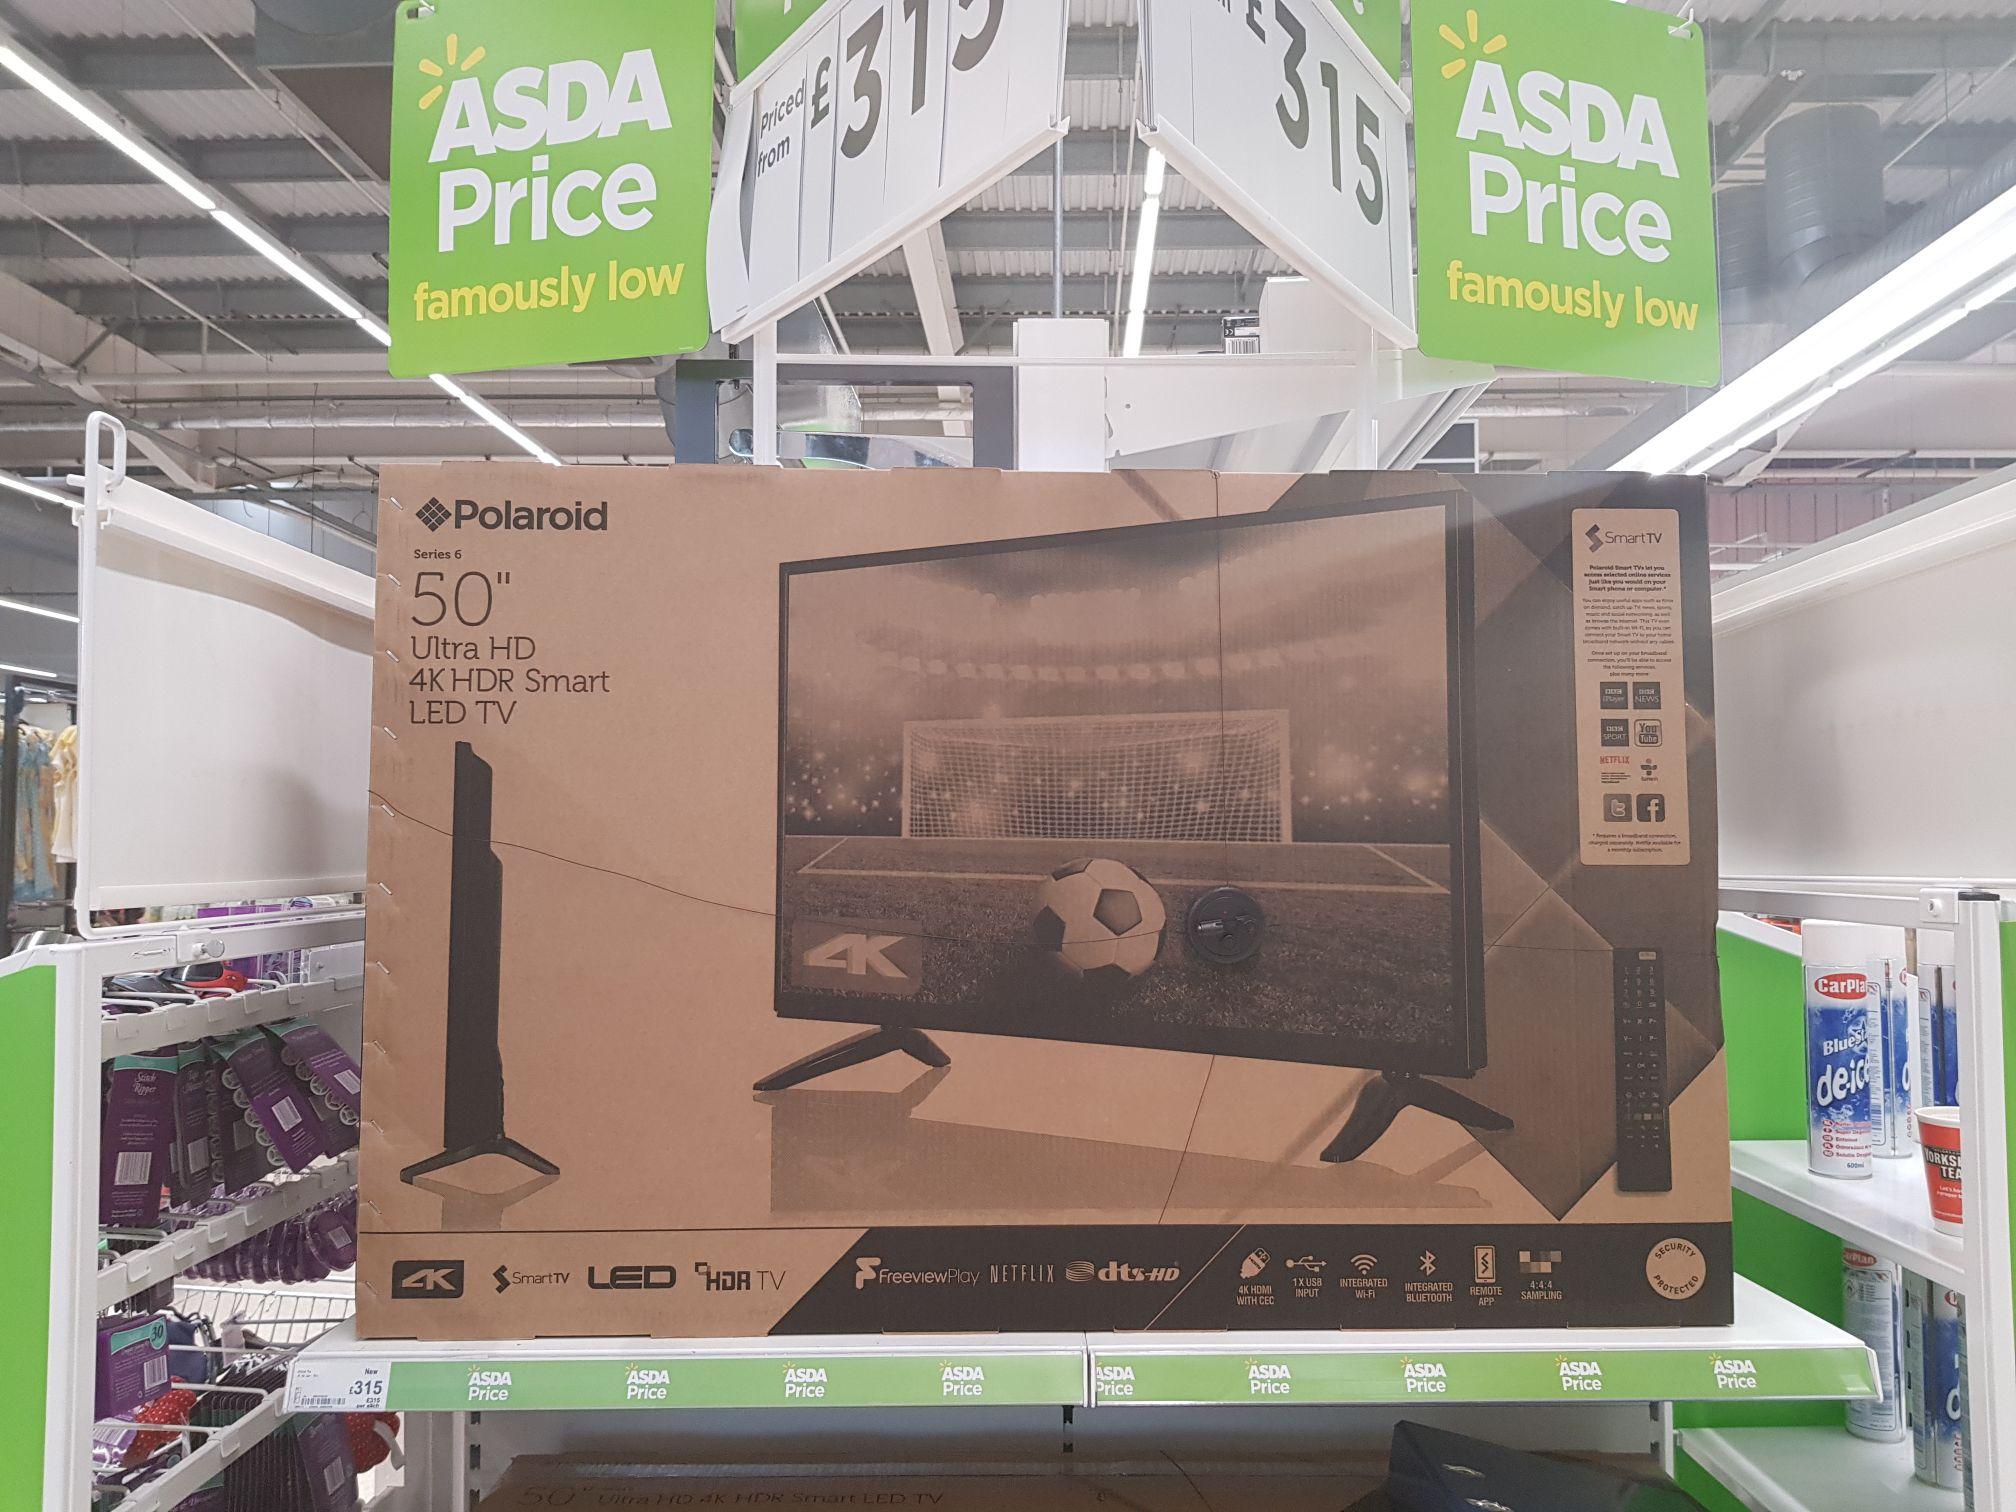 Polaroid 50 inch 4k series 6 TV at Asda £315 - hotukdeals